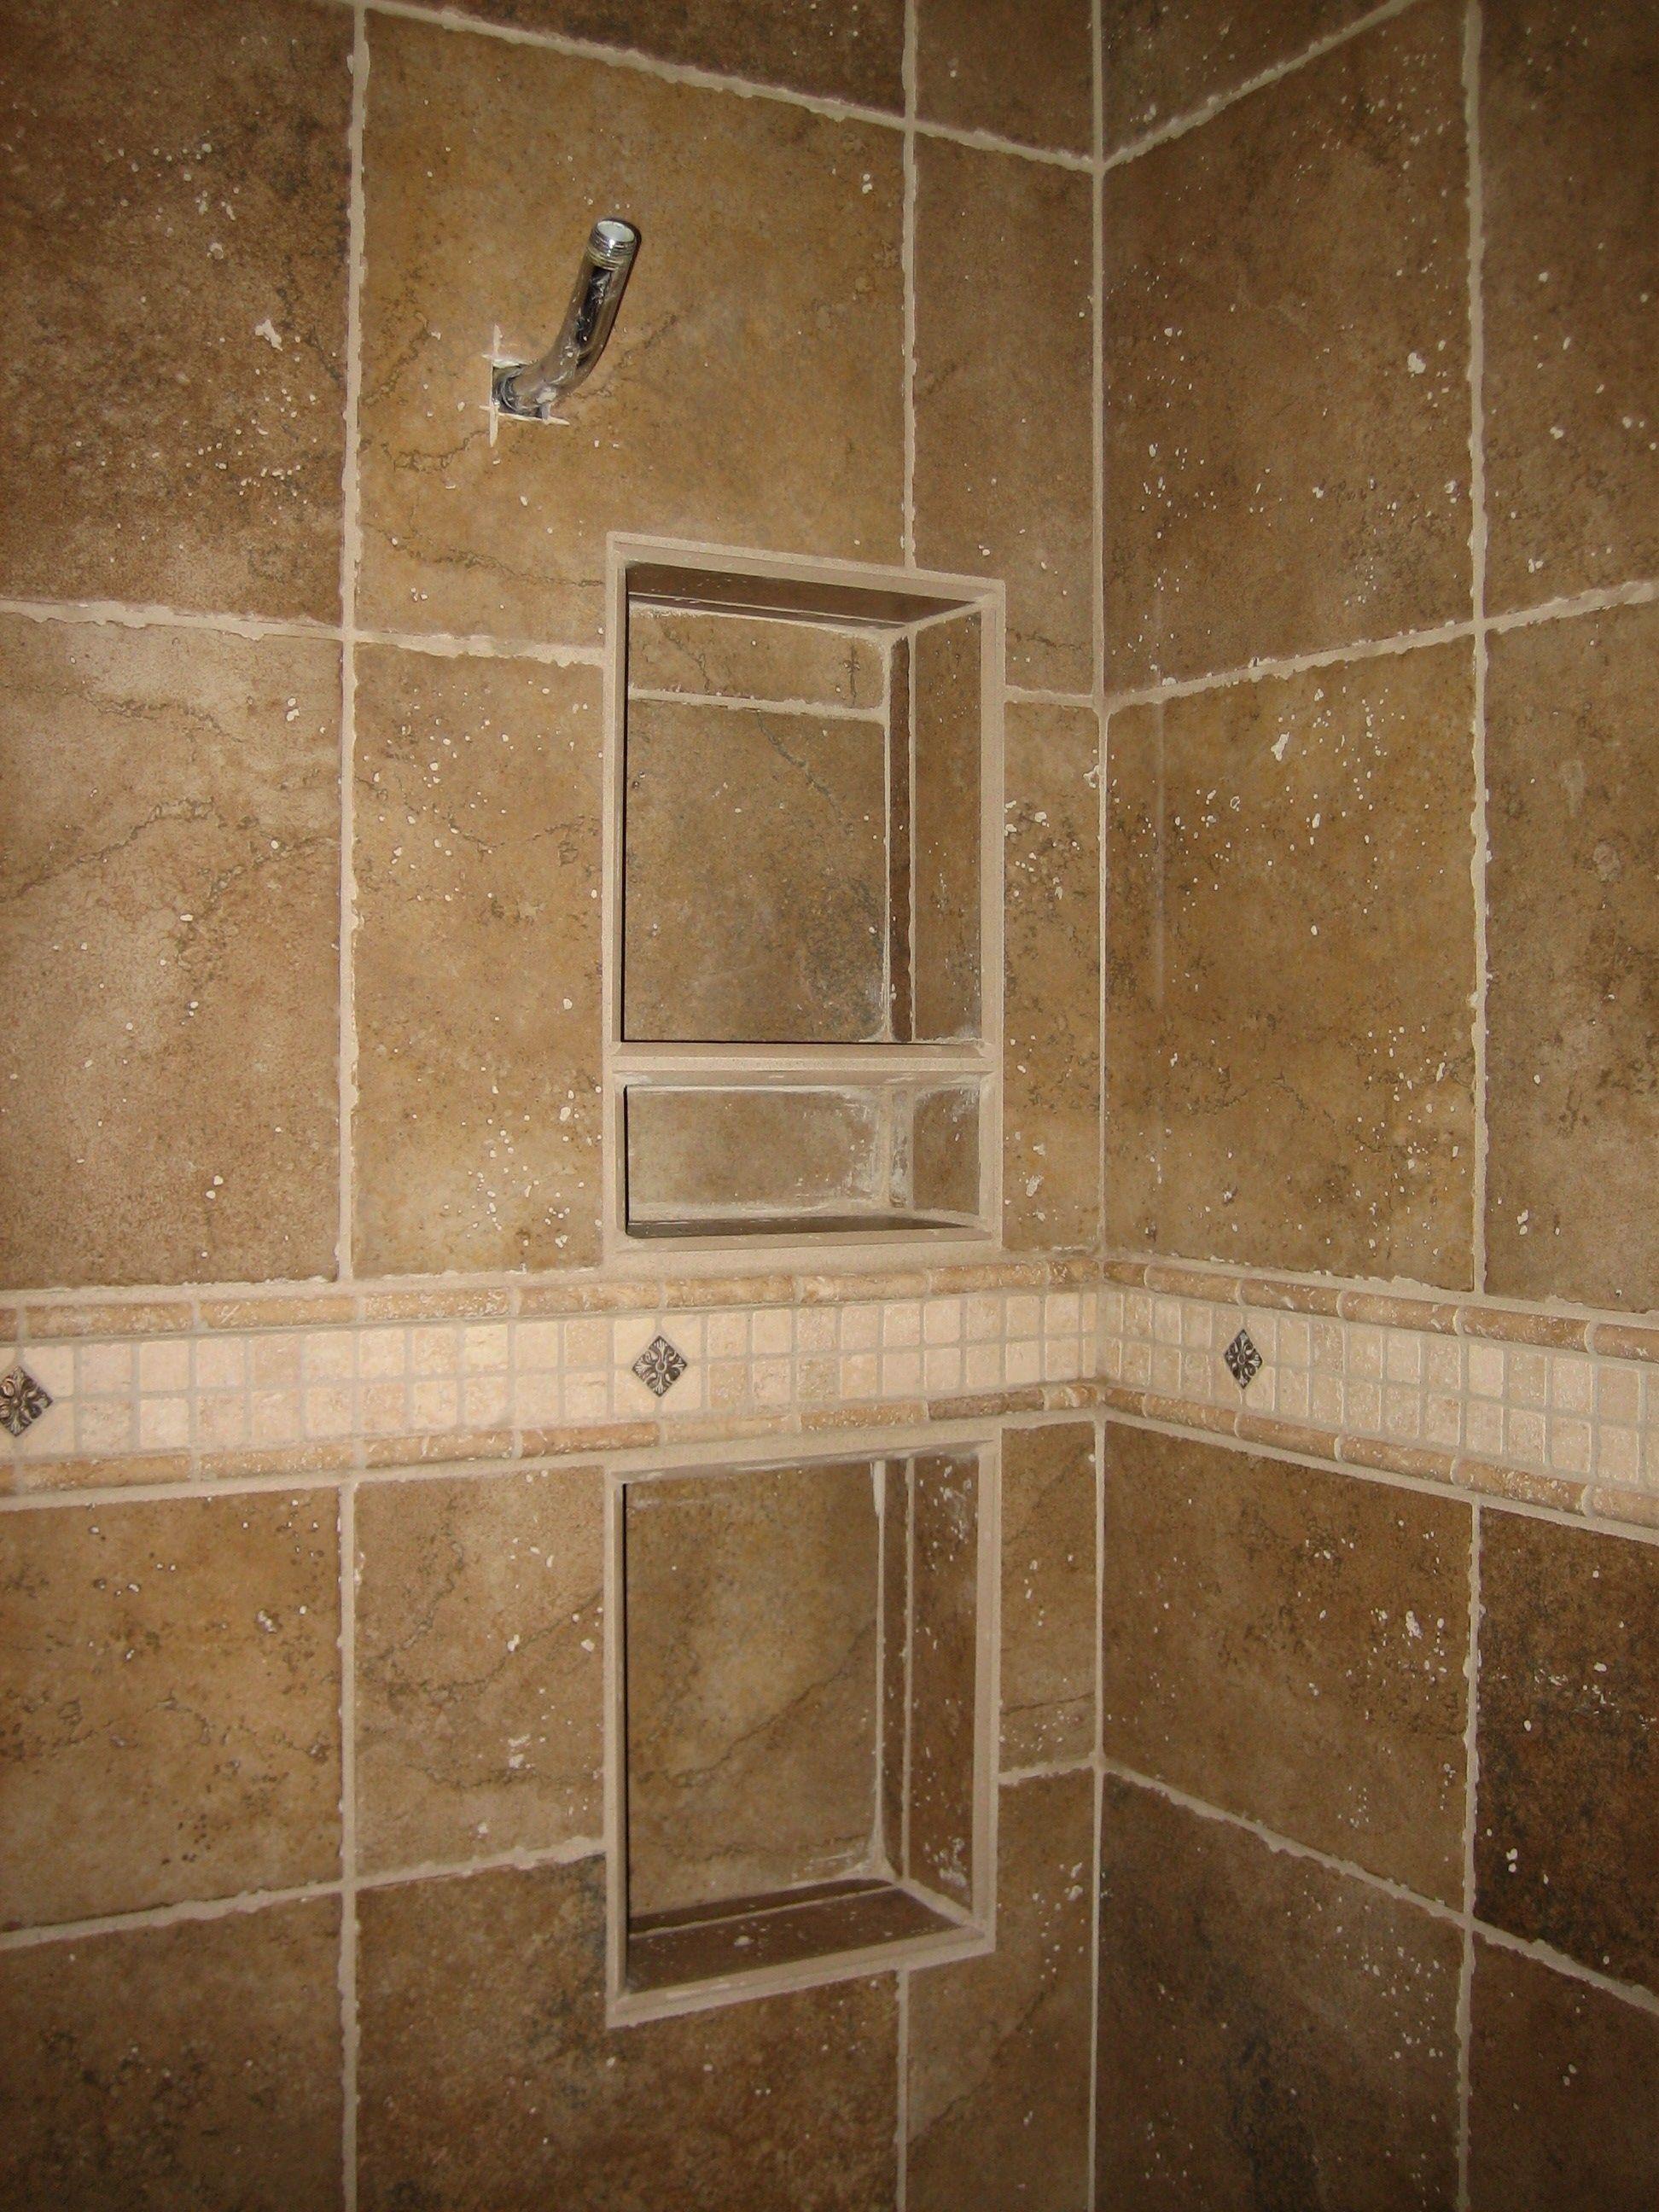 Ceramic tile shower caddy bathroom utensils pinterest tile ceramic tile shower caddy dailygadgetfo Image collections